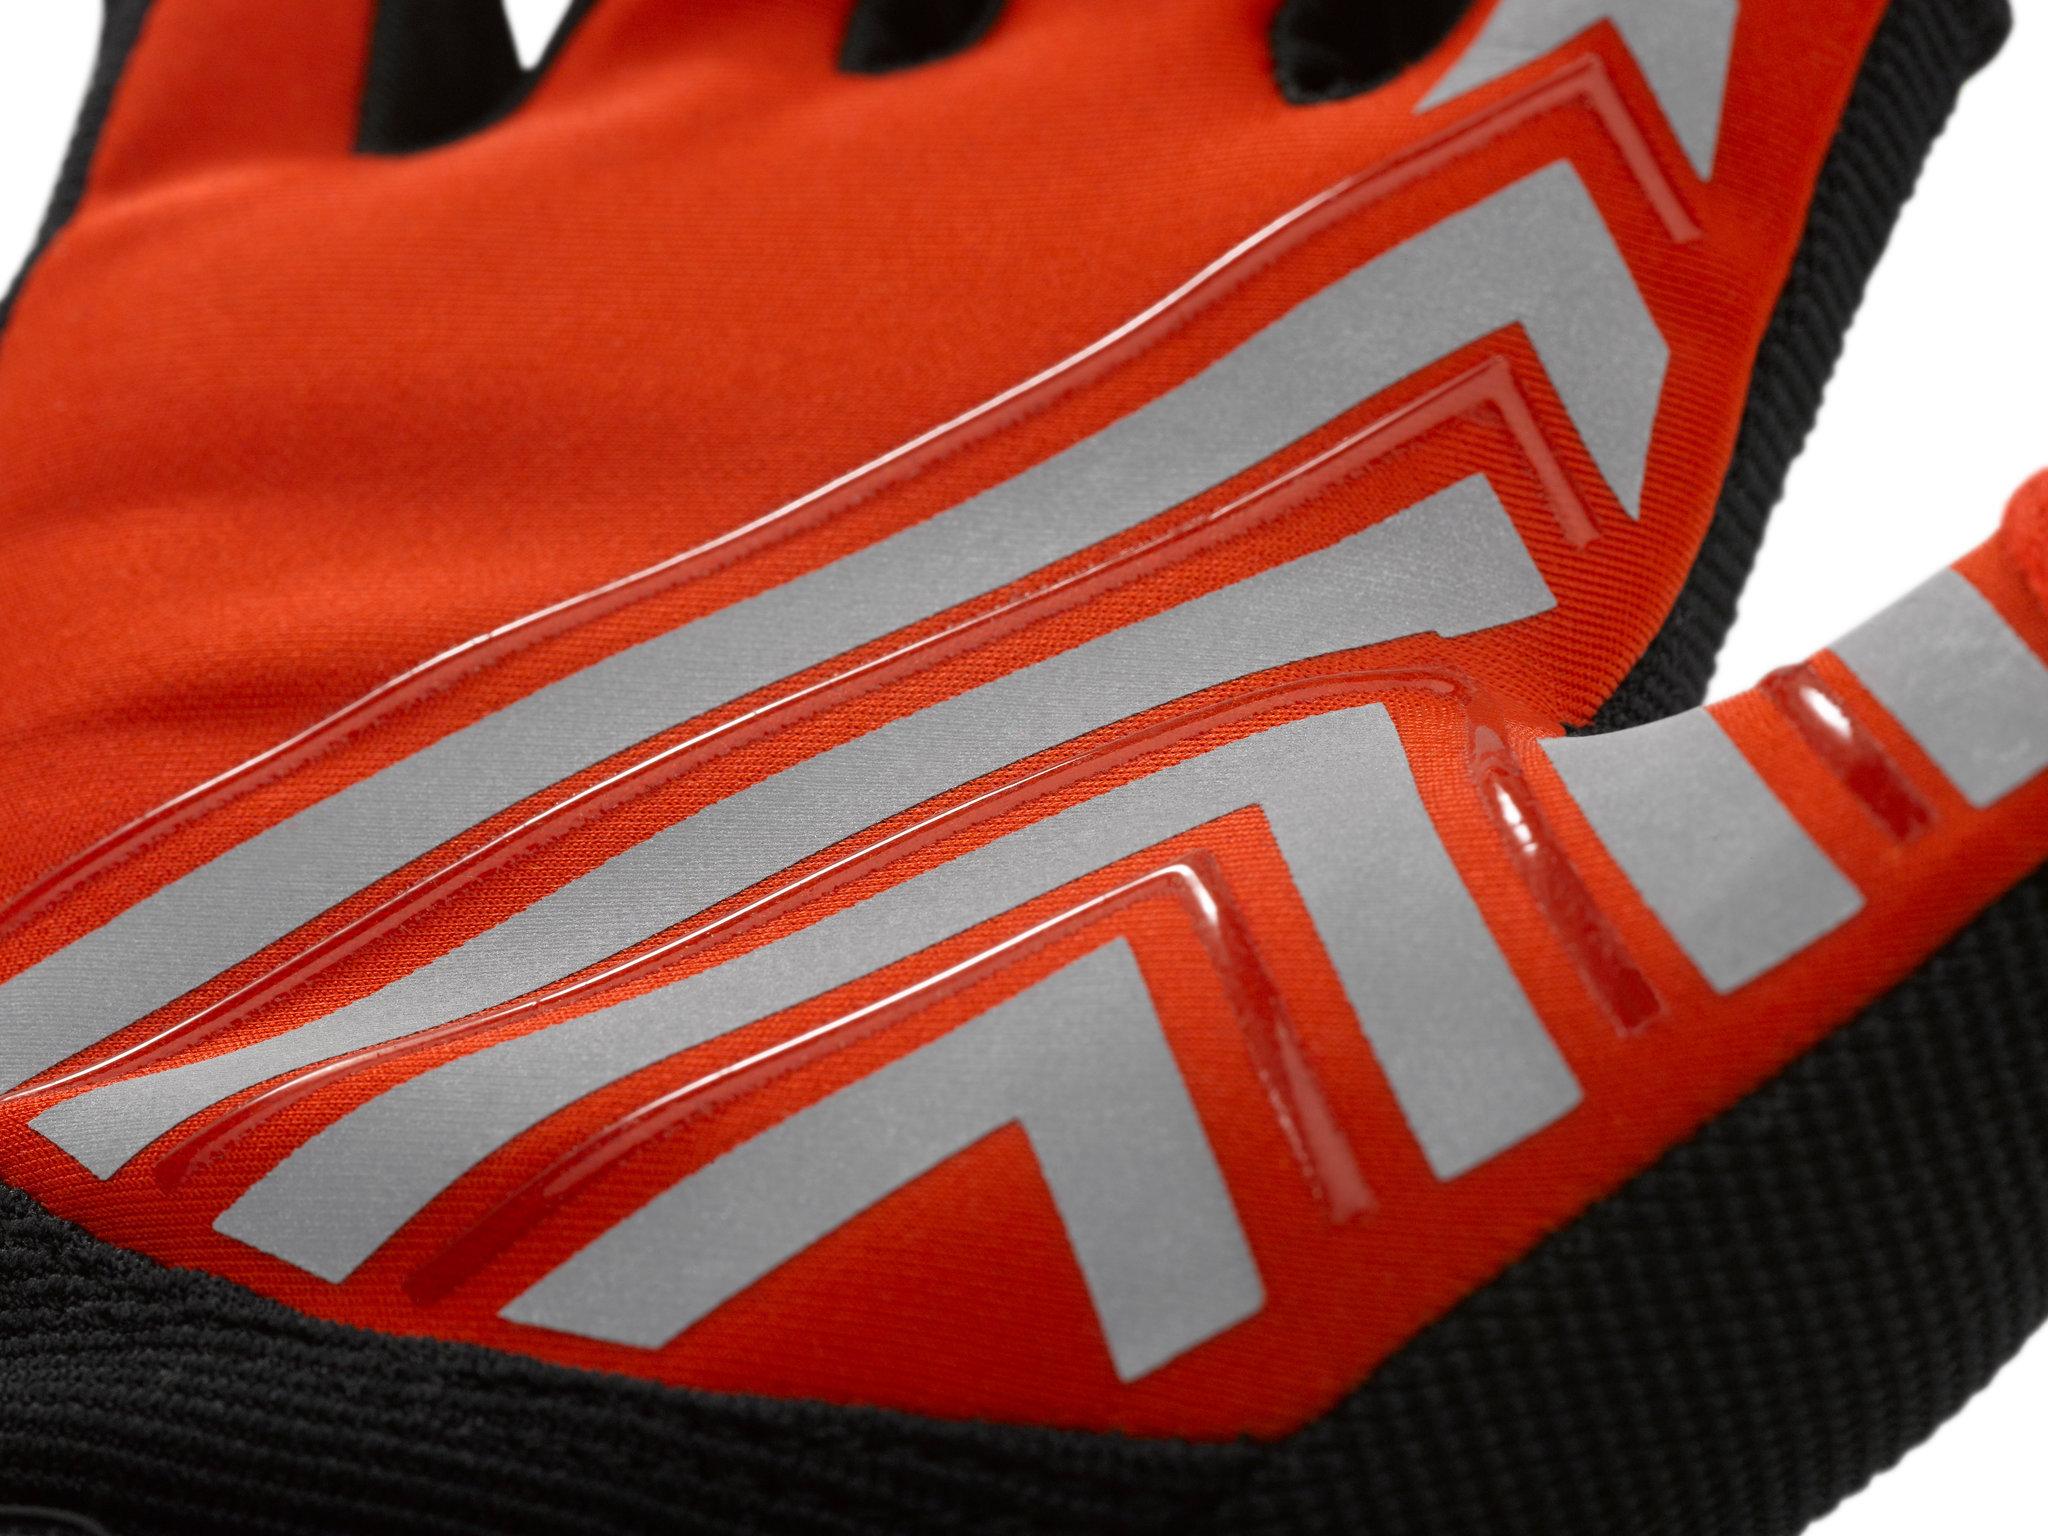 Blauer_Bolt-Shorty-Traffic_Glove_Detail_1.jpg